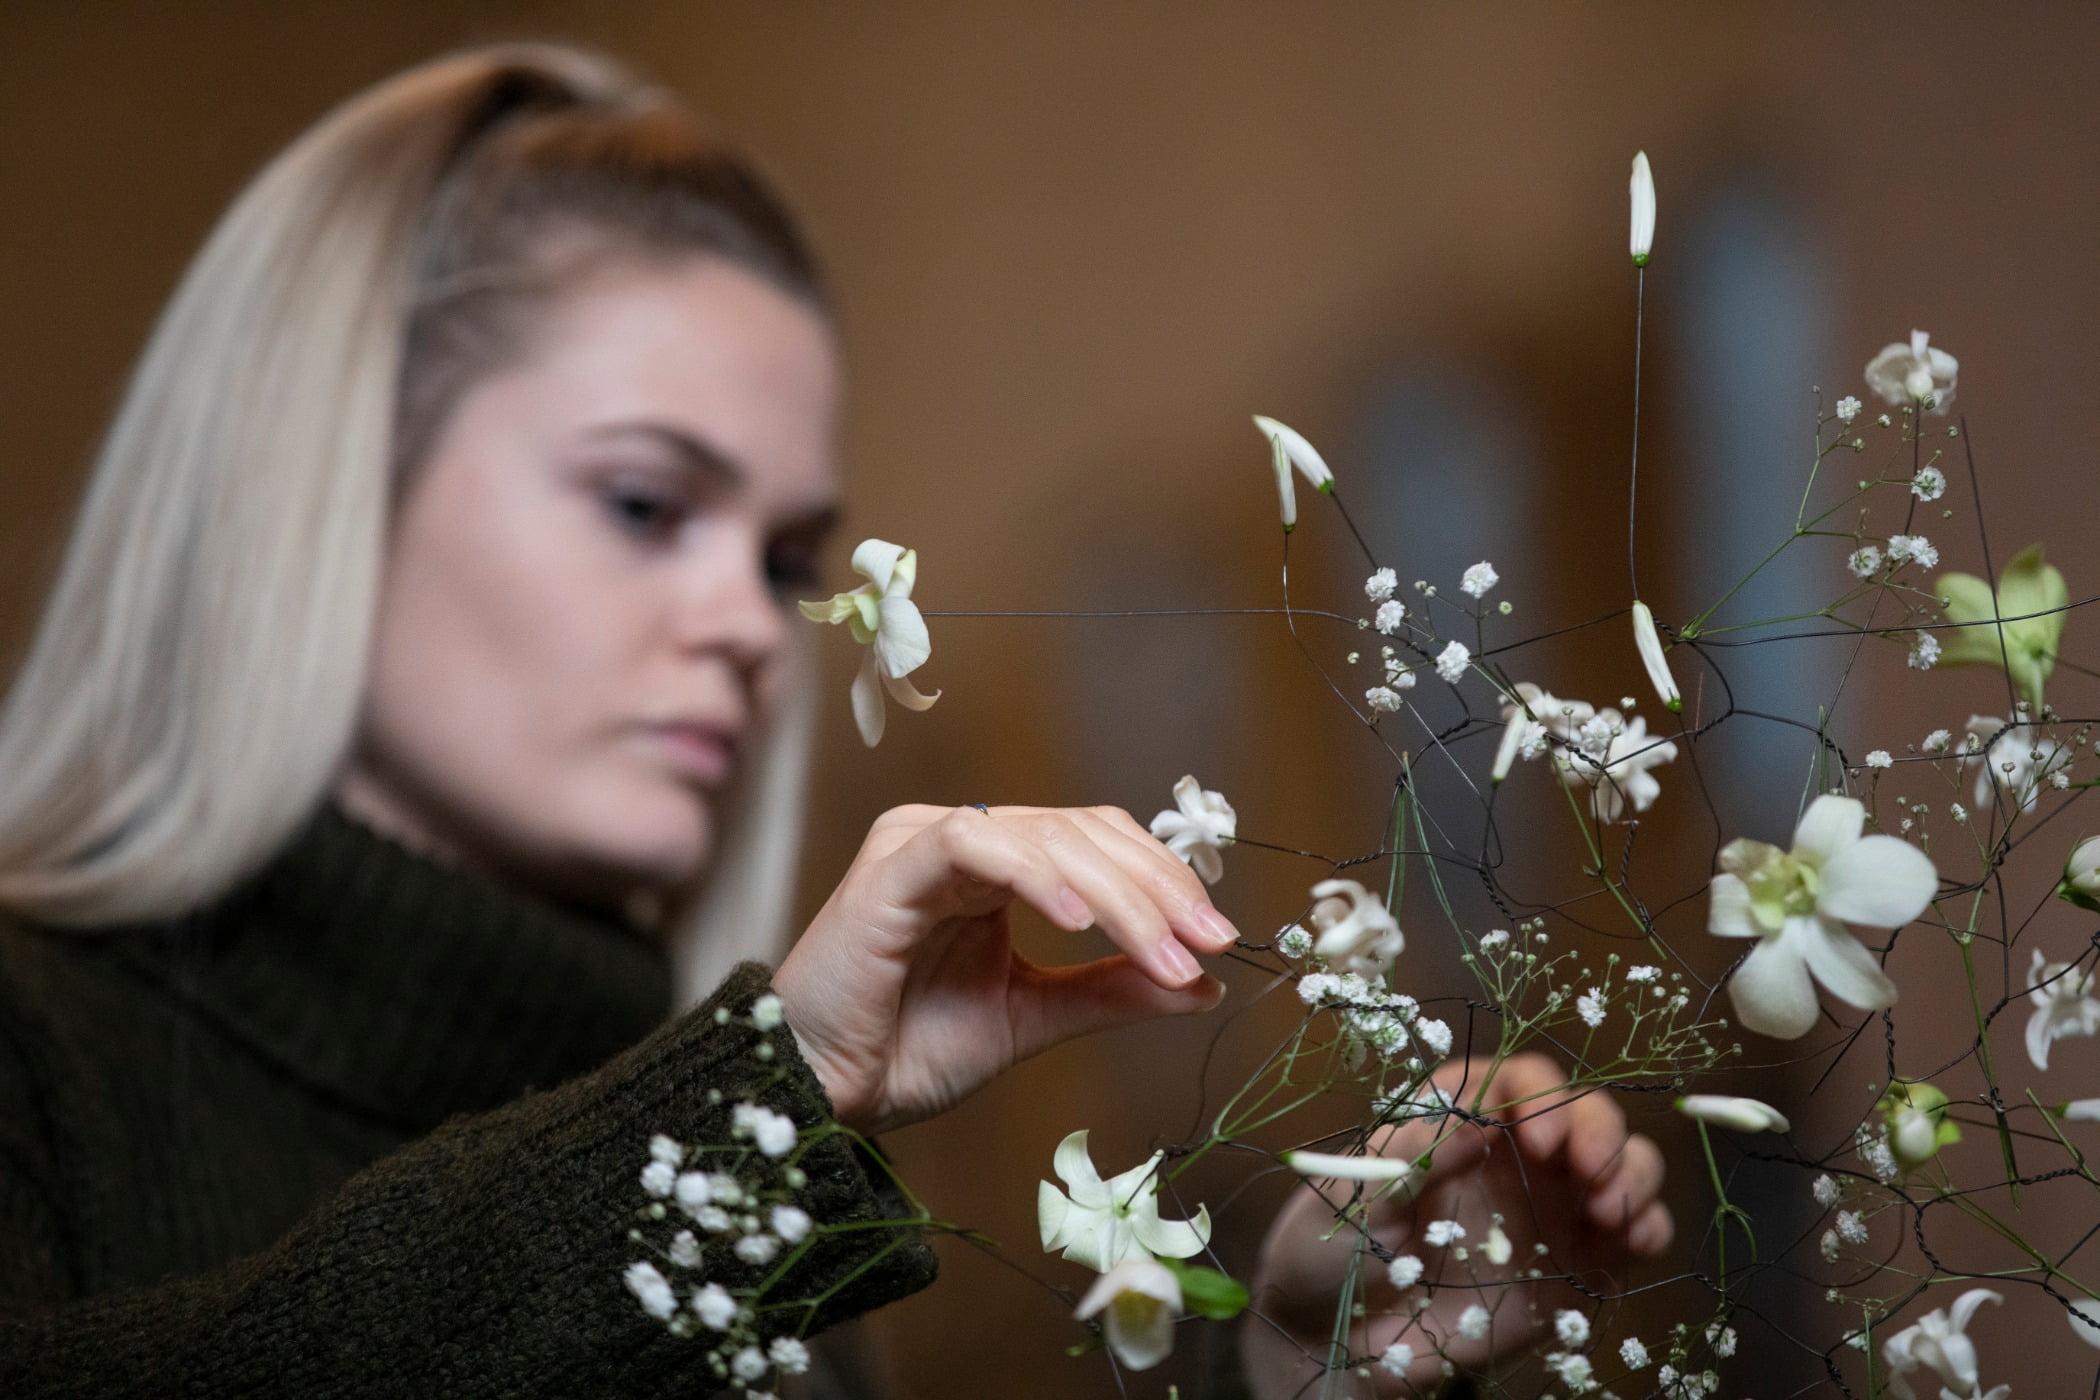 Flowering plant, Eyelash, Botany, Flower, Petal